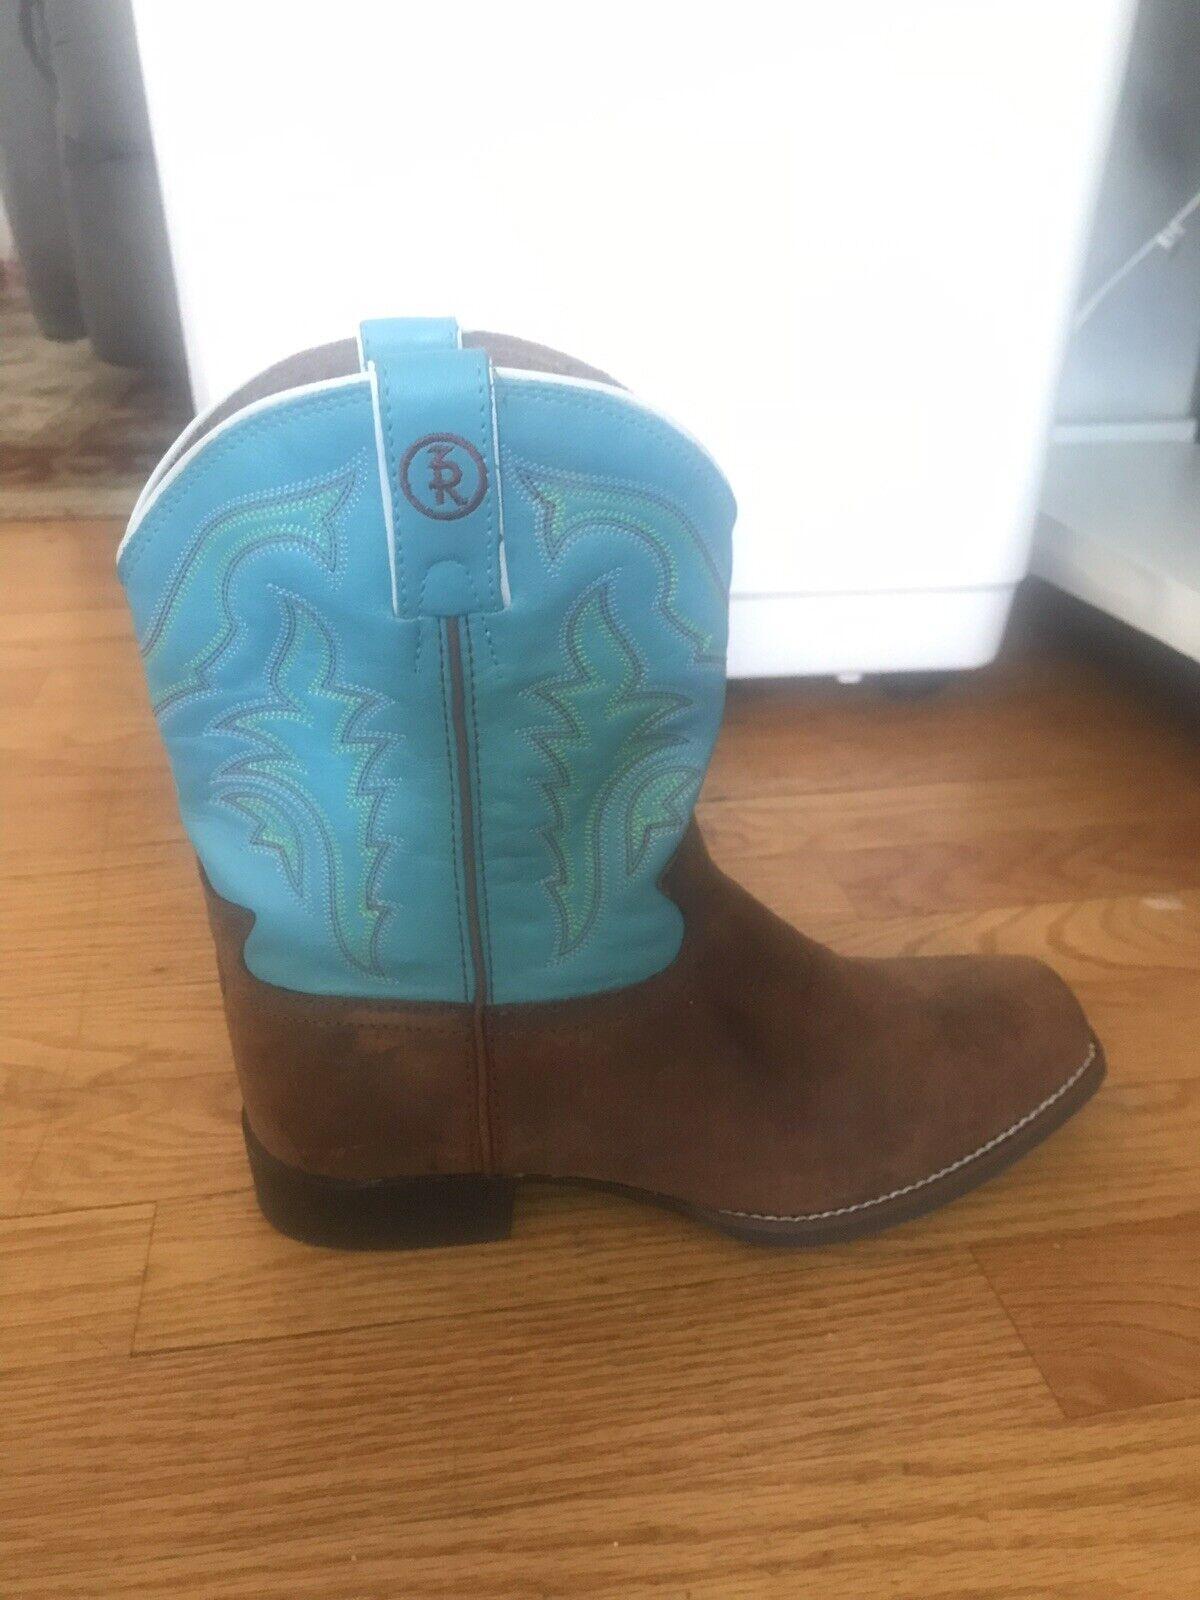 Tony Lama Lama Lama Cowboy Western Boot Turquoise  bspringaaa Square Toe Storlek 6W Vacker  många medgivanden